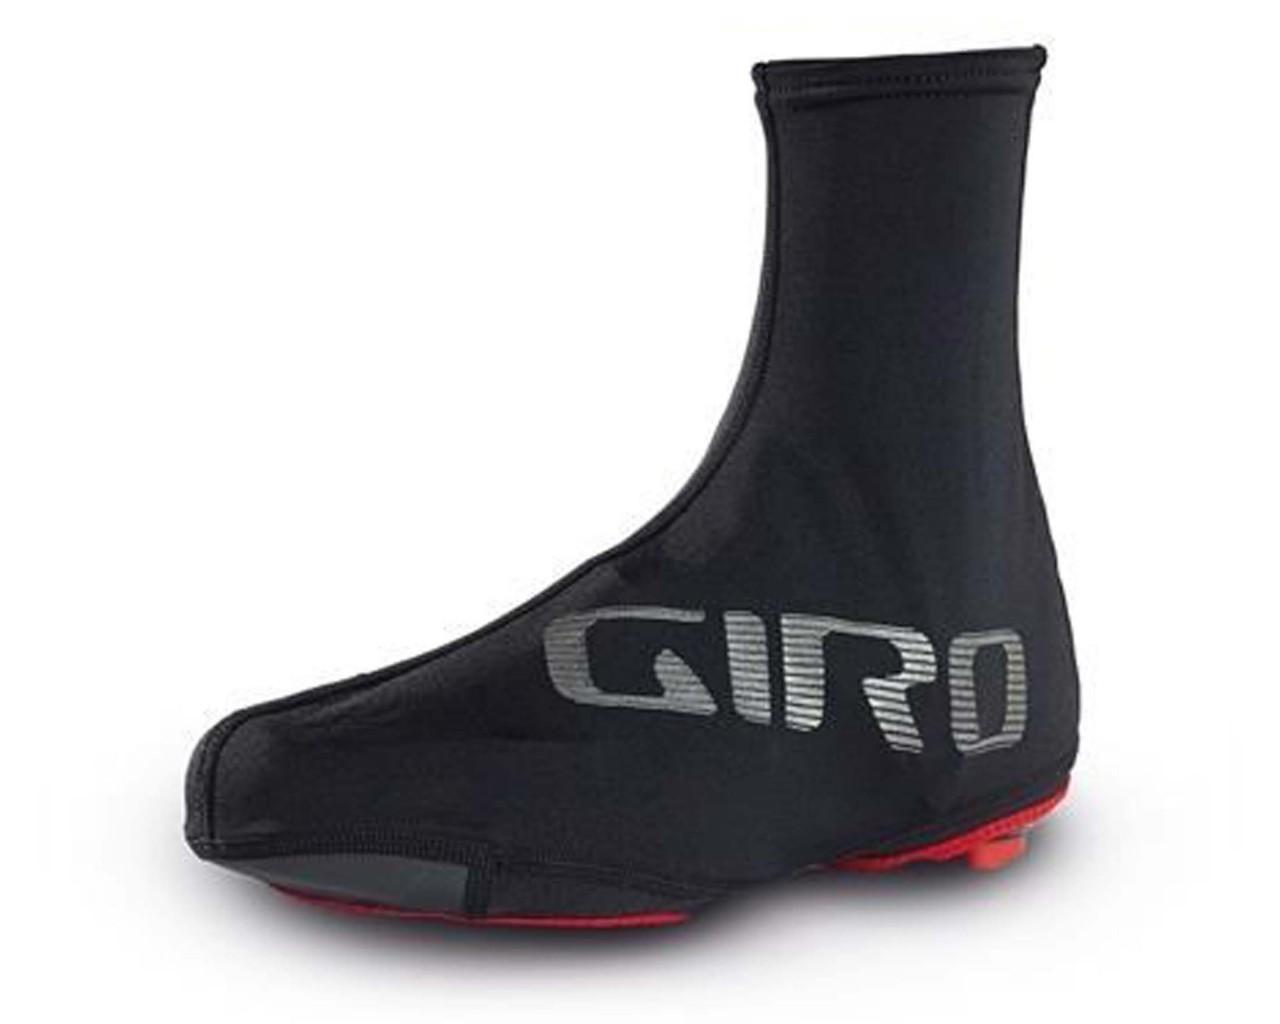 Giro Ultralight Aero Shoe Cover - Überschuhe | black